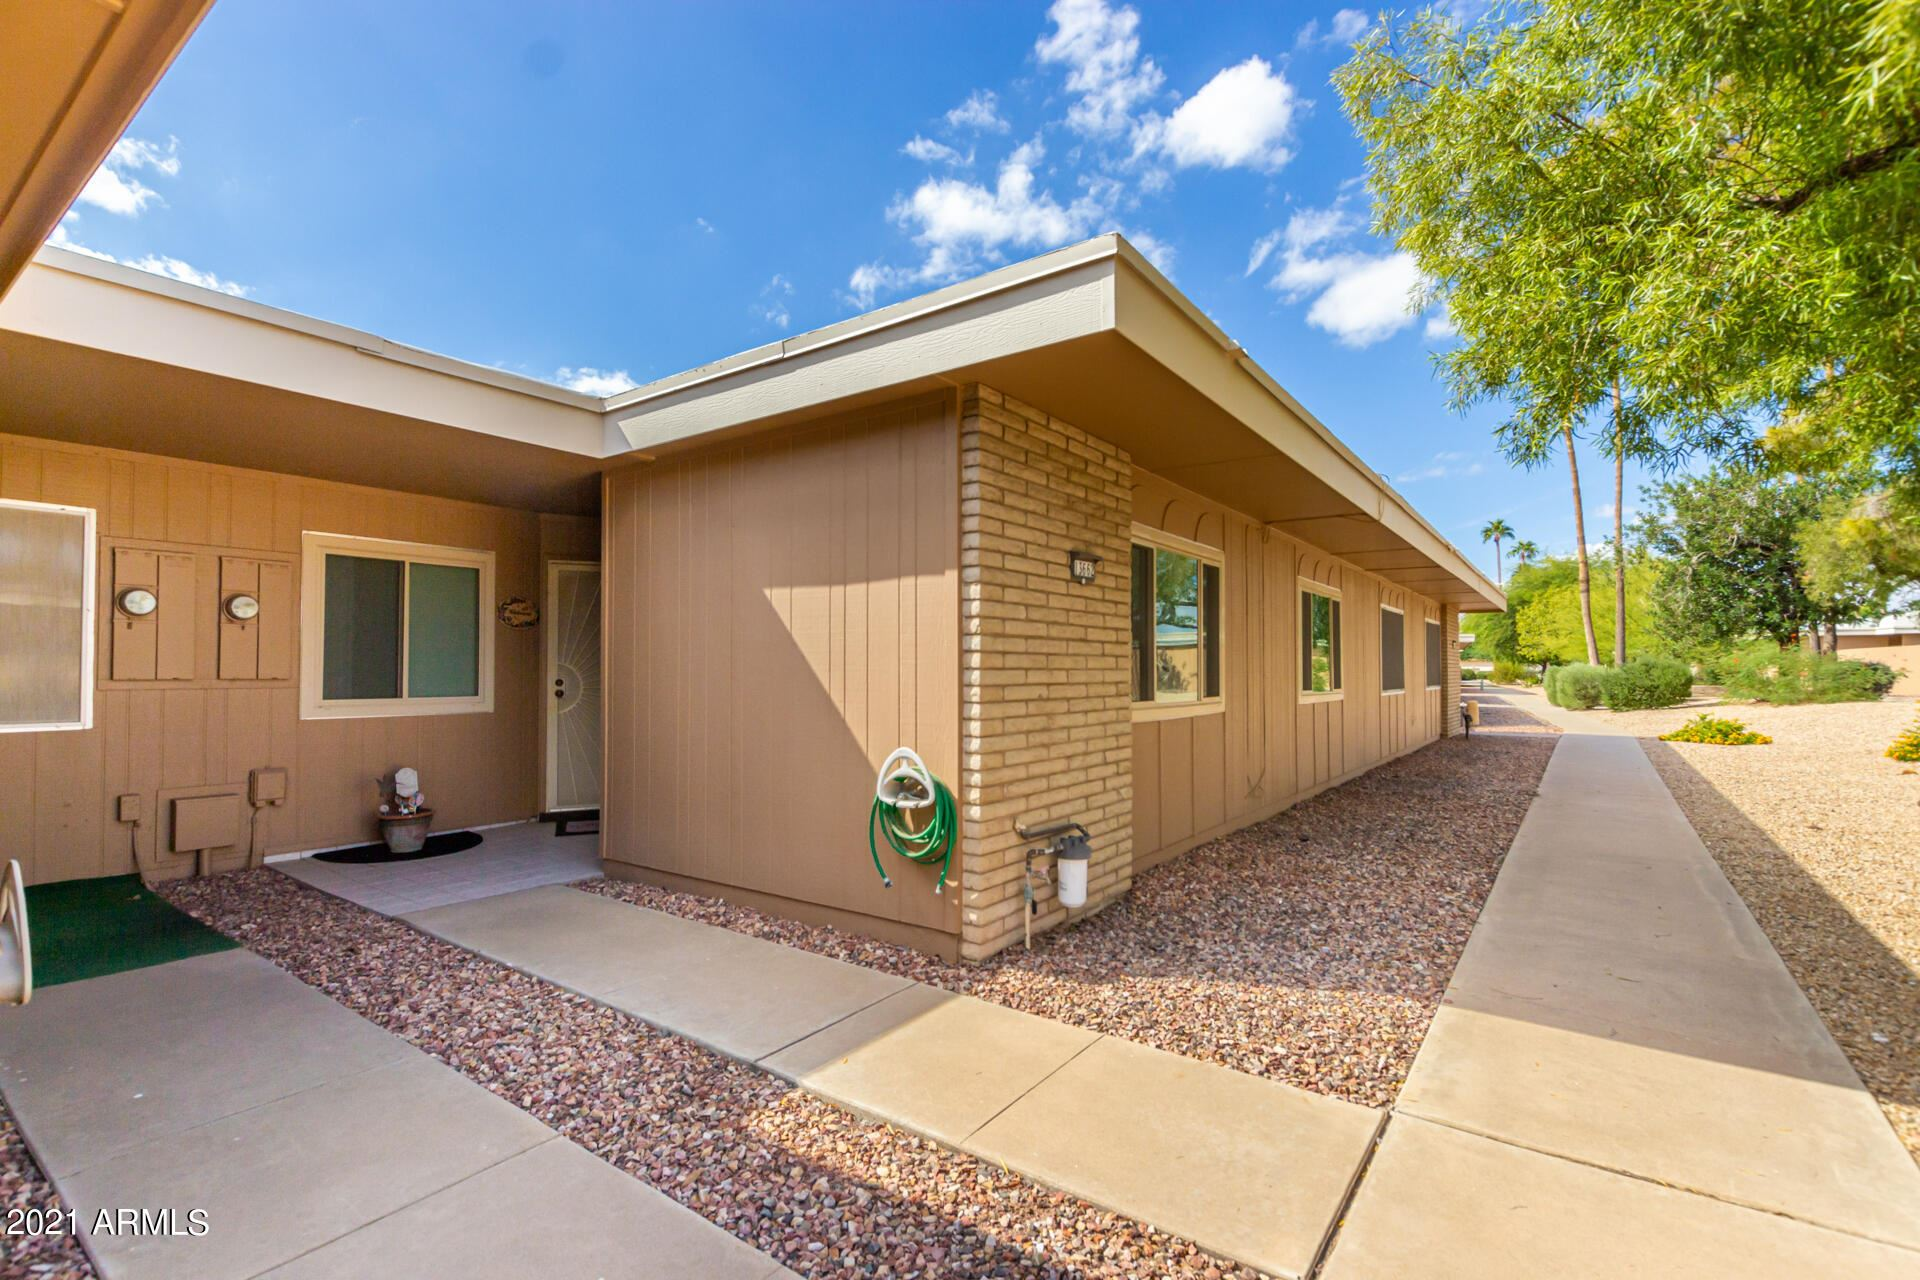 Photo of 13662 N 108th Drive, Sun City, AZ 85351 (MLS # 6307515)